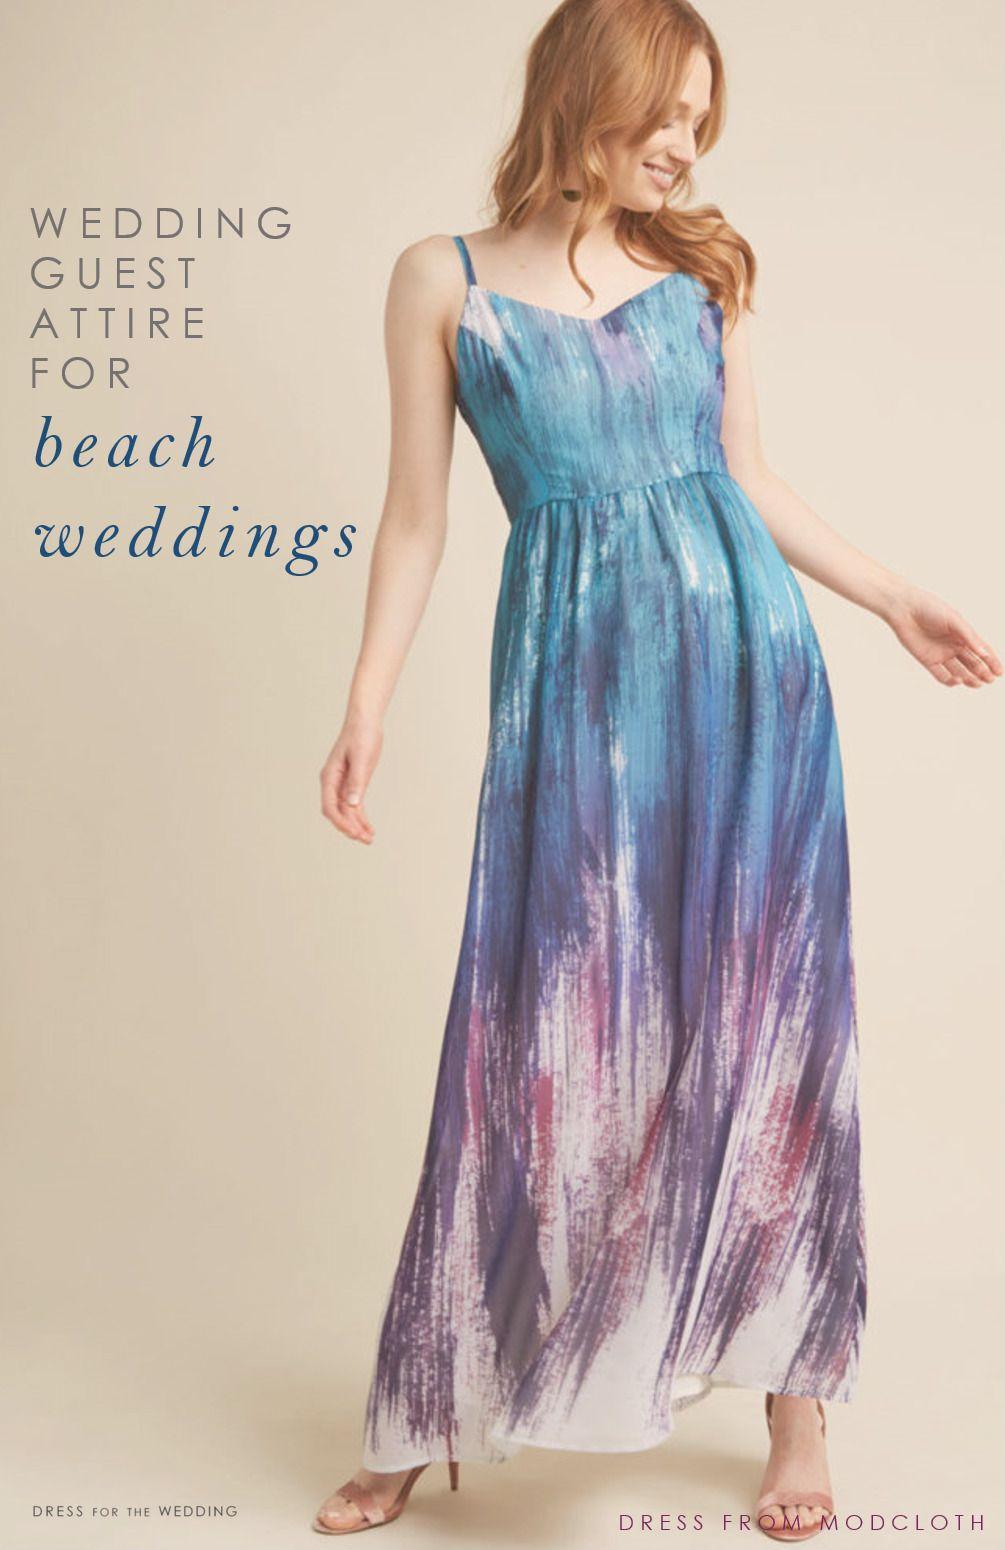 Beach Wedding Guest Dresses Dress For The Wedding Casual Wedding Guest Attire Wedding Attire Guest Beach Wedding Guest Dress [ 1550 x 1005 Pixel ]